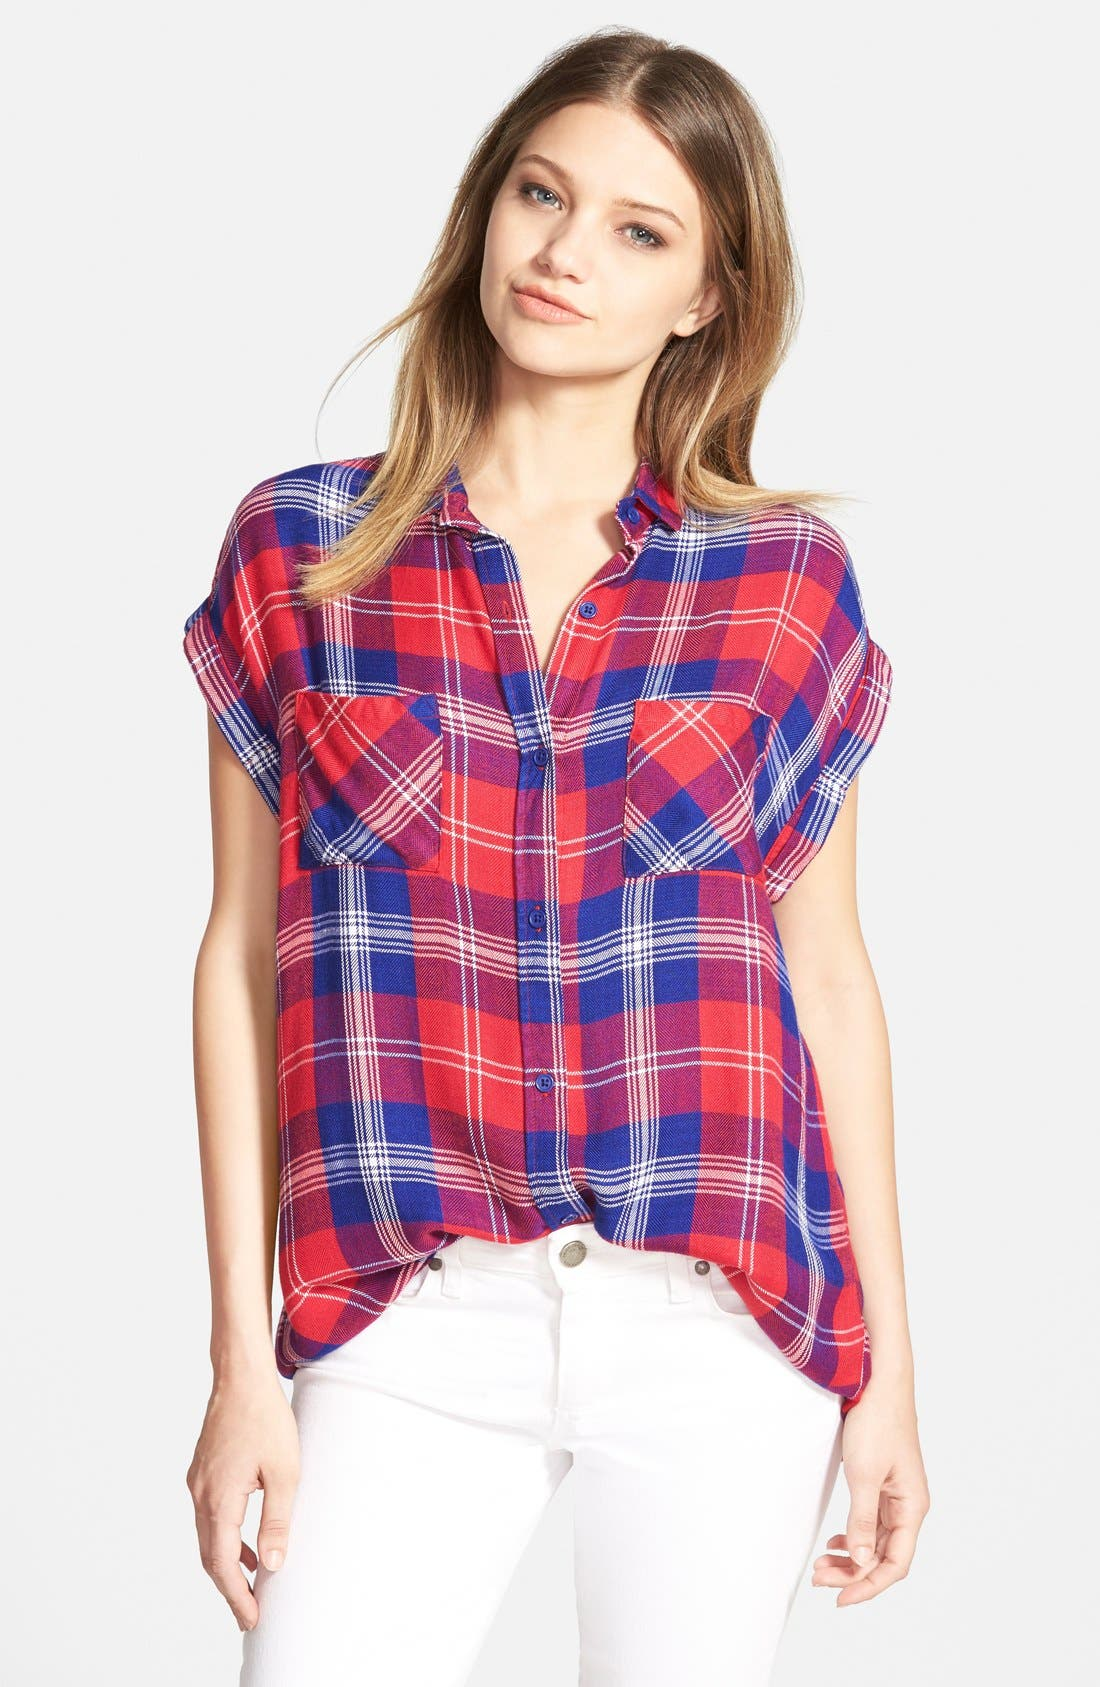 Alternate Image 1 Selected - Rails 'Britt' Plaid Shirt